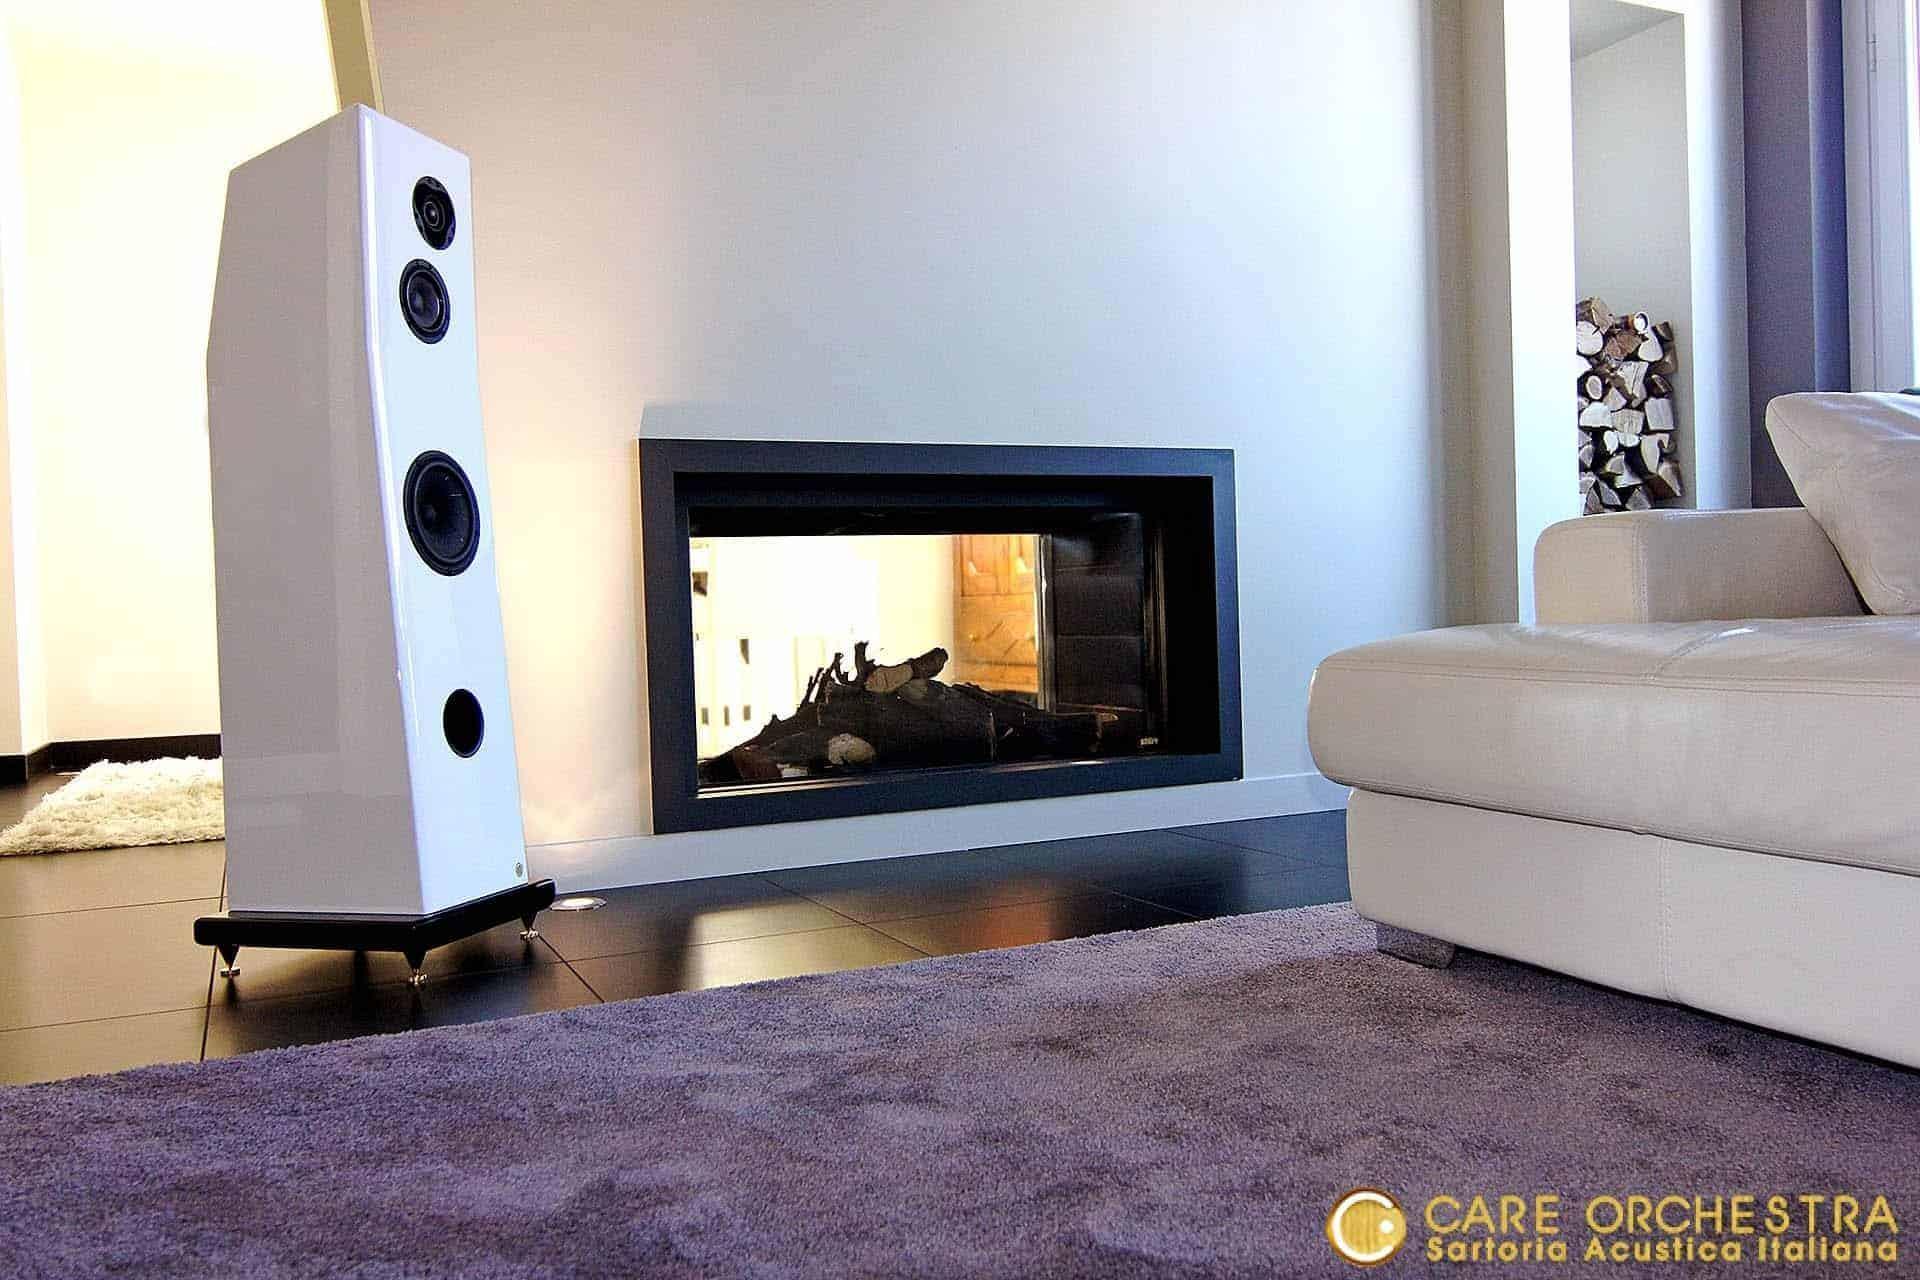 Care orchestra diffusori acustici di design supreme - Casse acustiche design ...